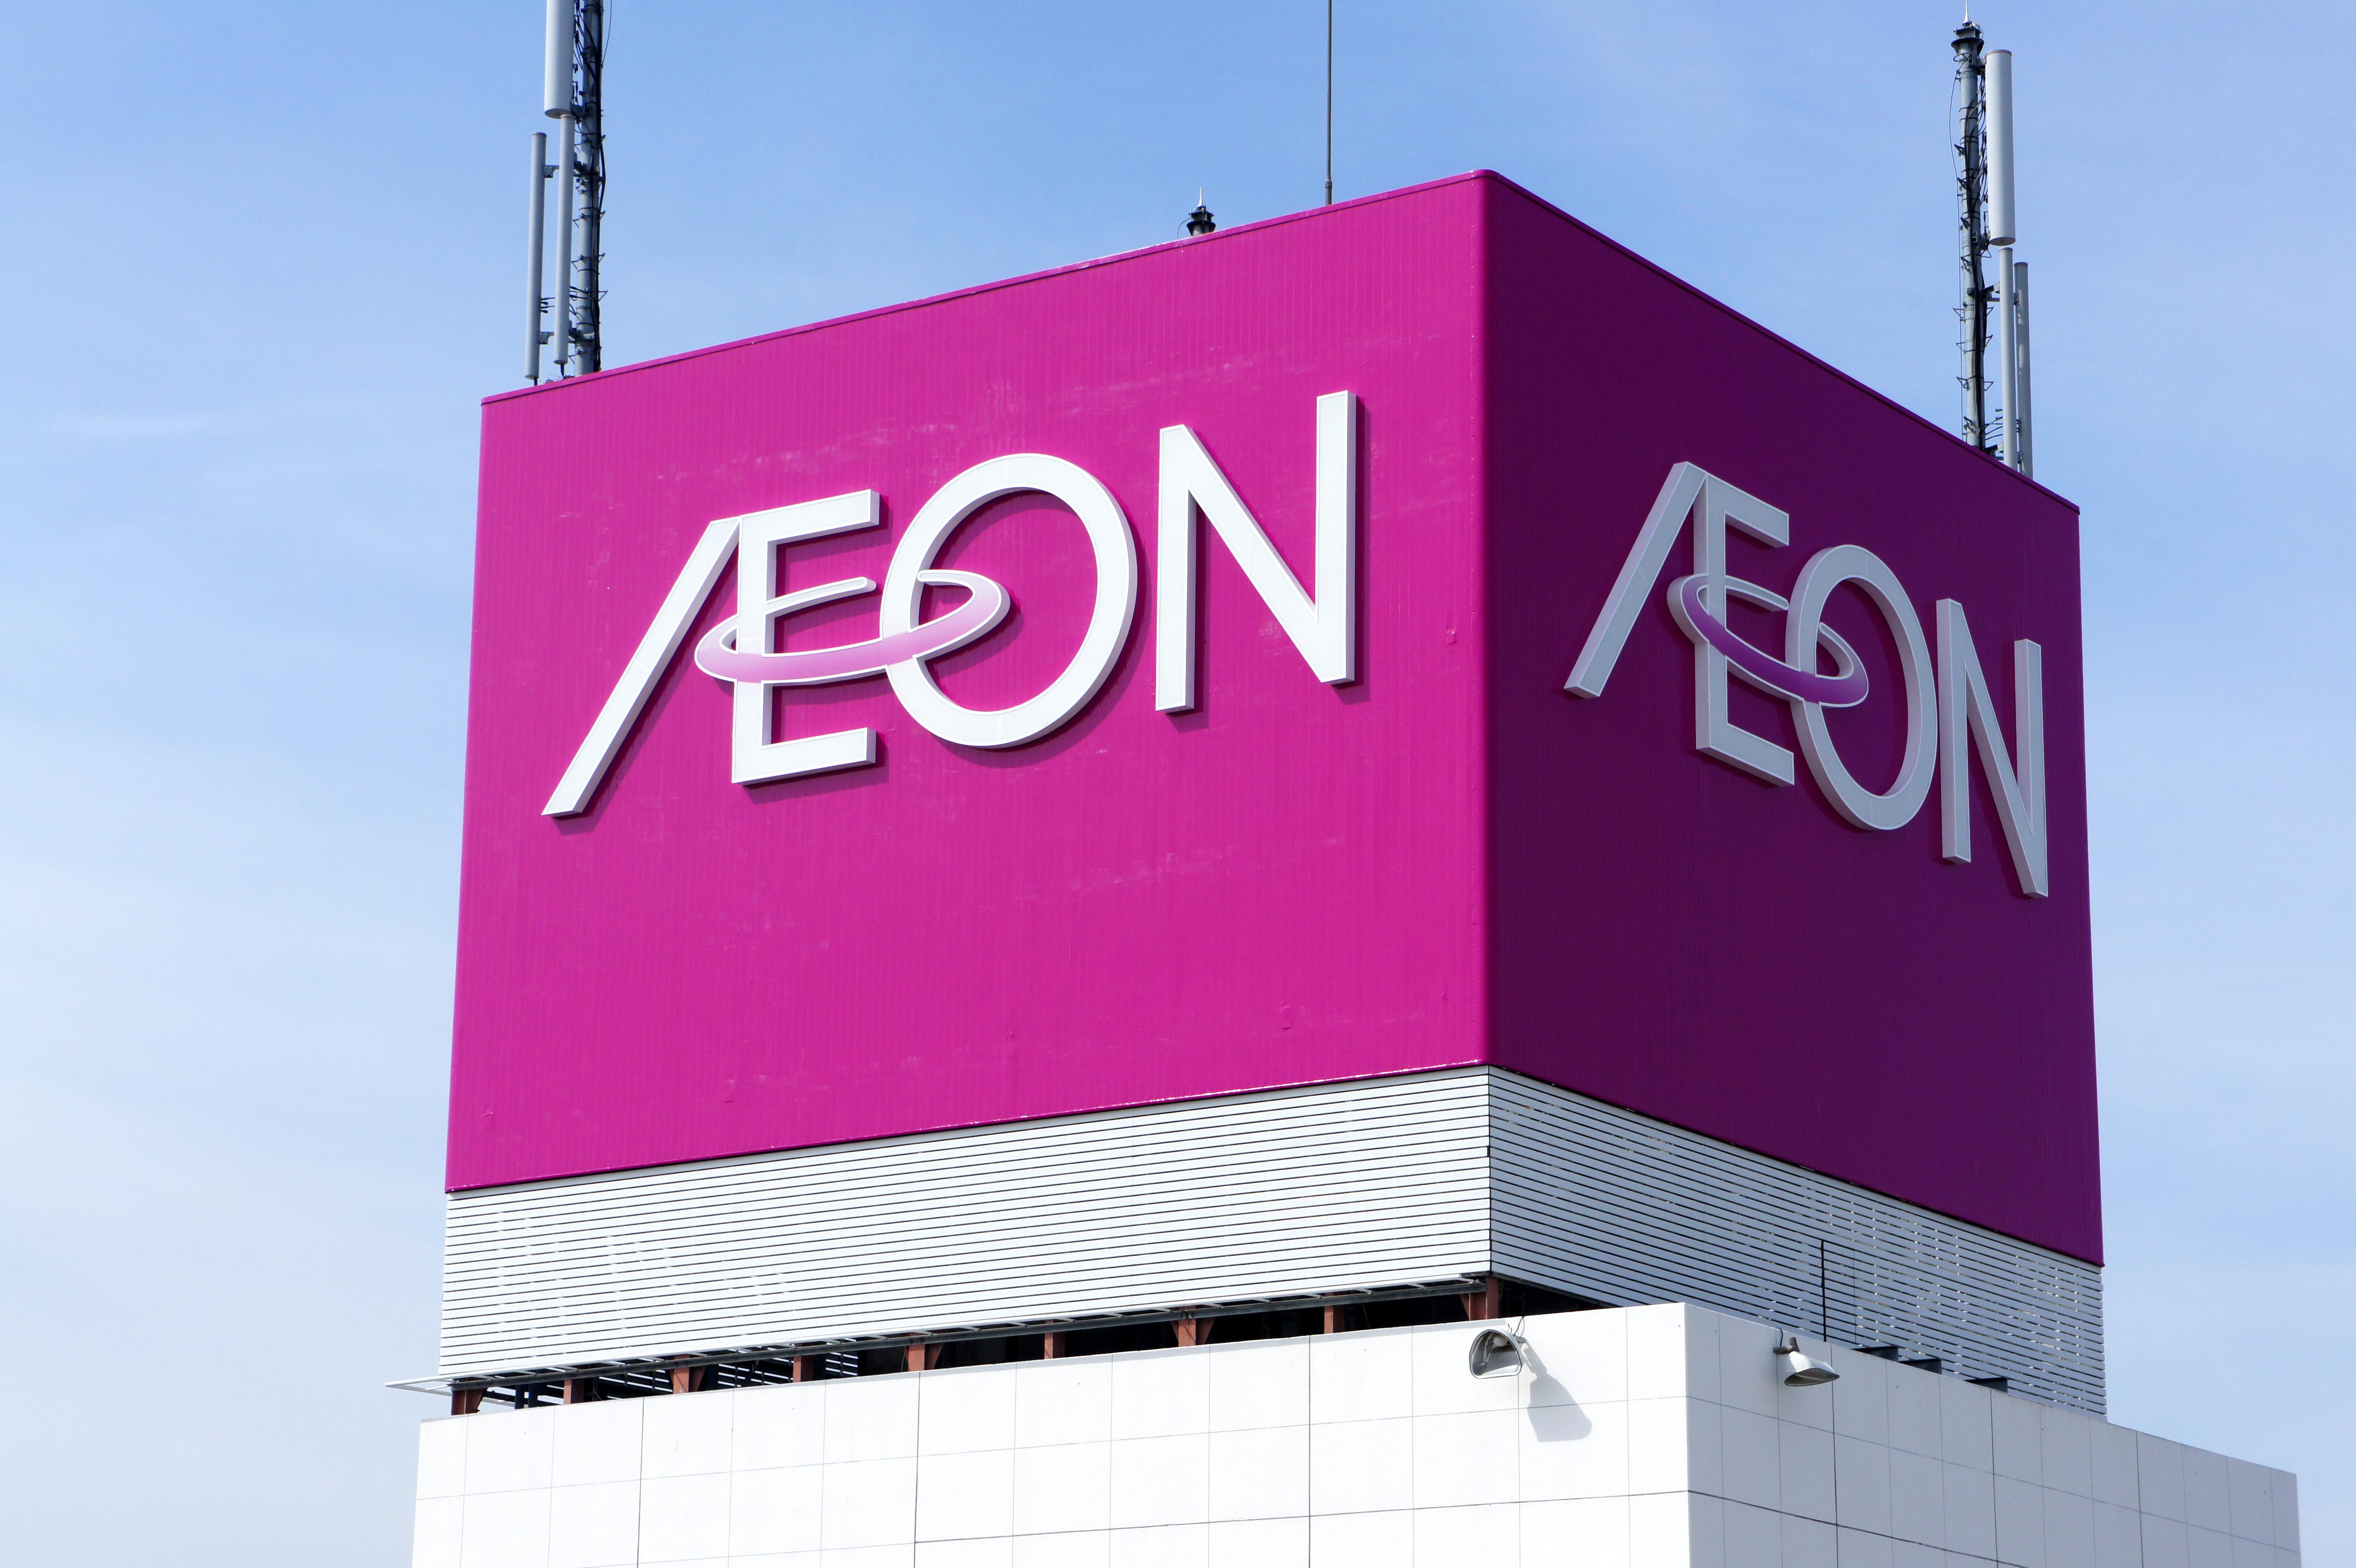 Top Things to Do Near AEON Mall Tebrau City (Jusco Tebrau City), Johor Bahru, Malaysia